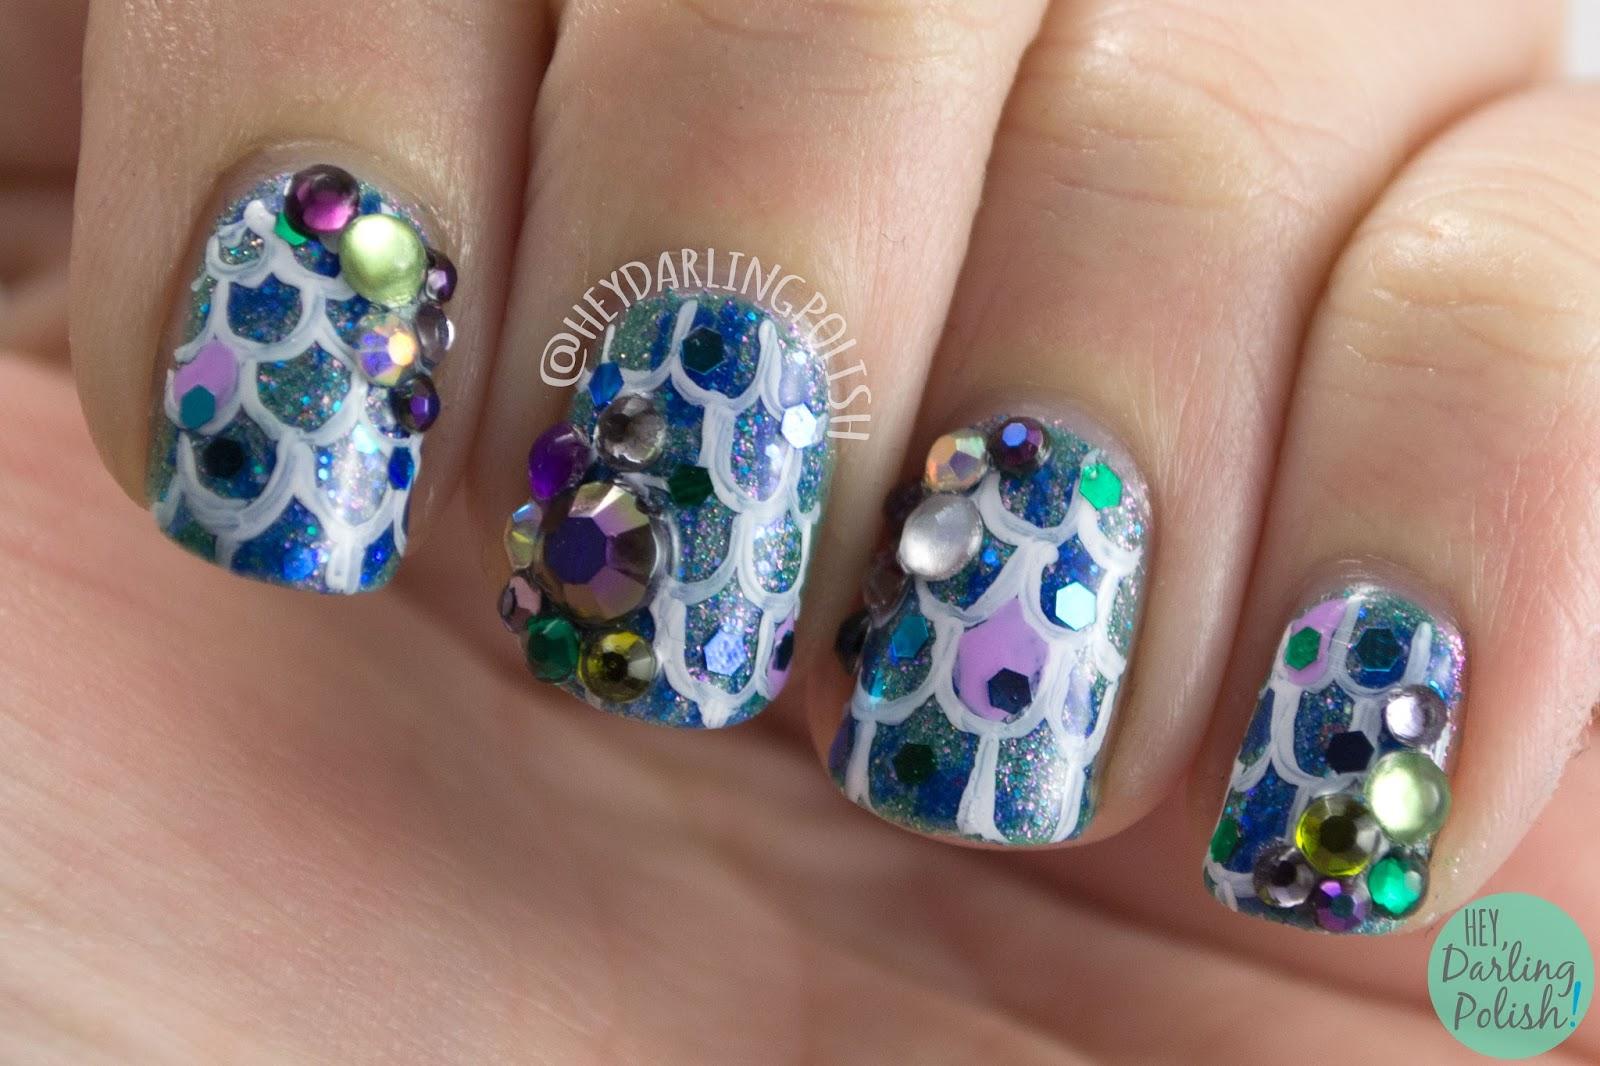 nails, nail art, nail polish, hey darling polish, mermaid, rhinestones, glitter, 52 week challenge, glitzy